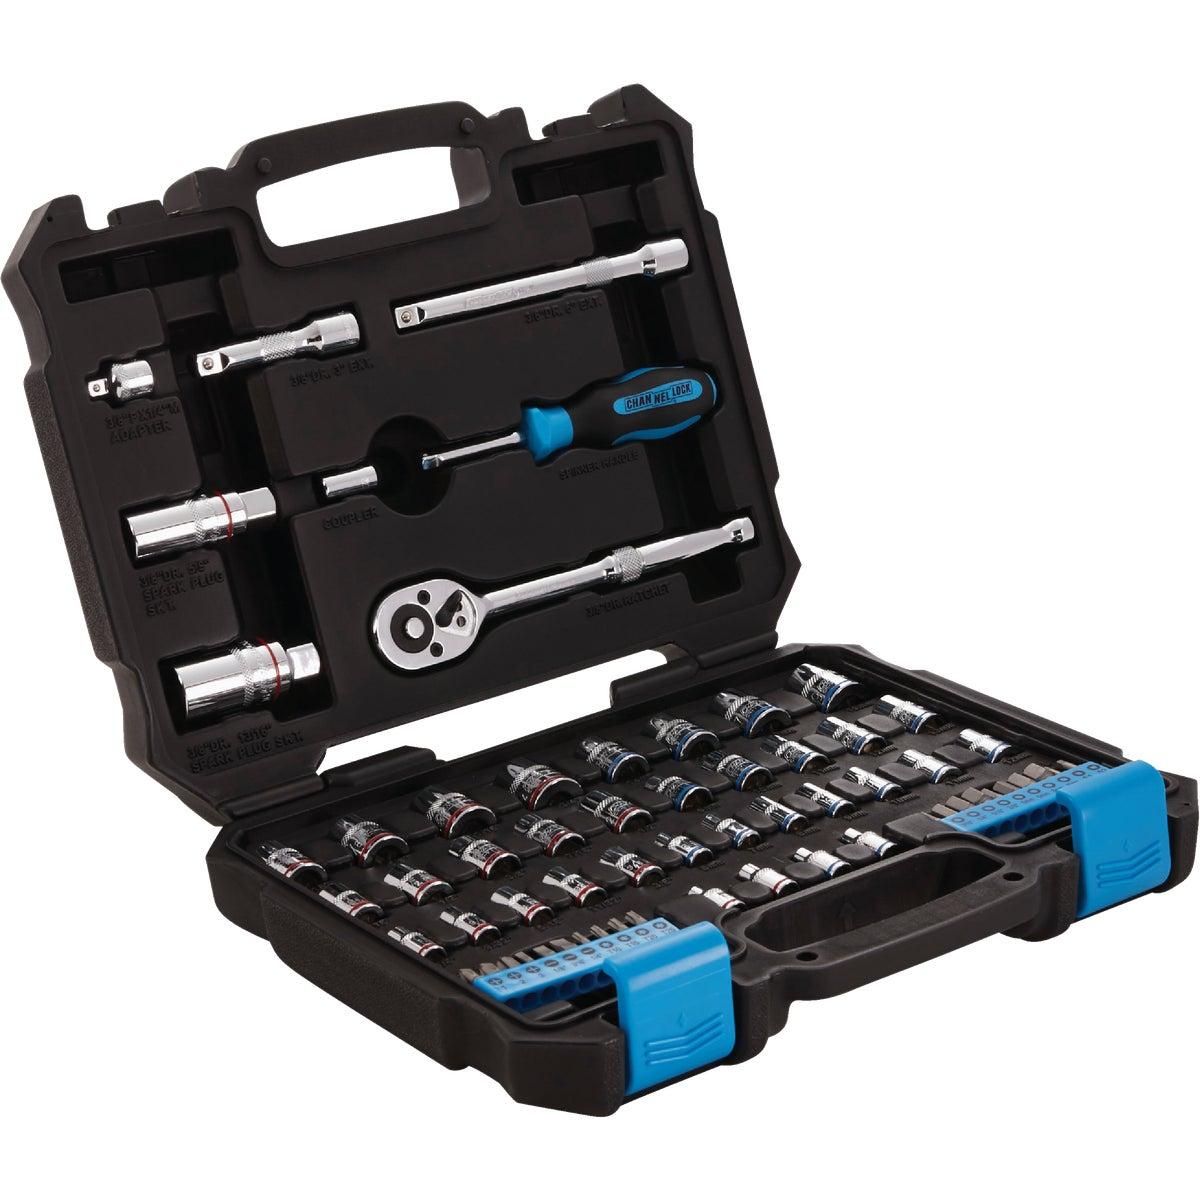 DIB Tool Imports 42PC 1/4-3/8 SOCKET SET 346713